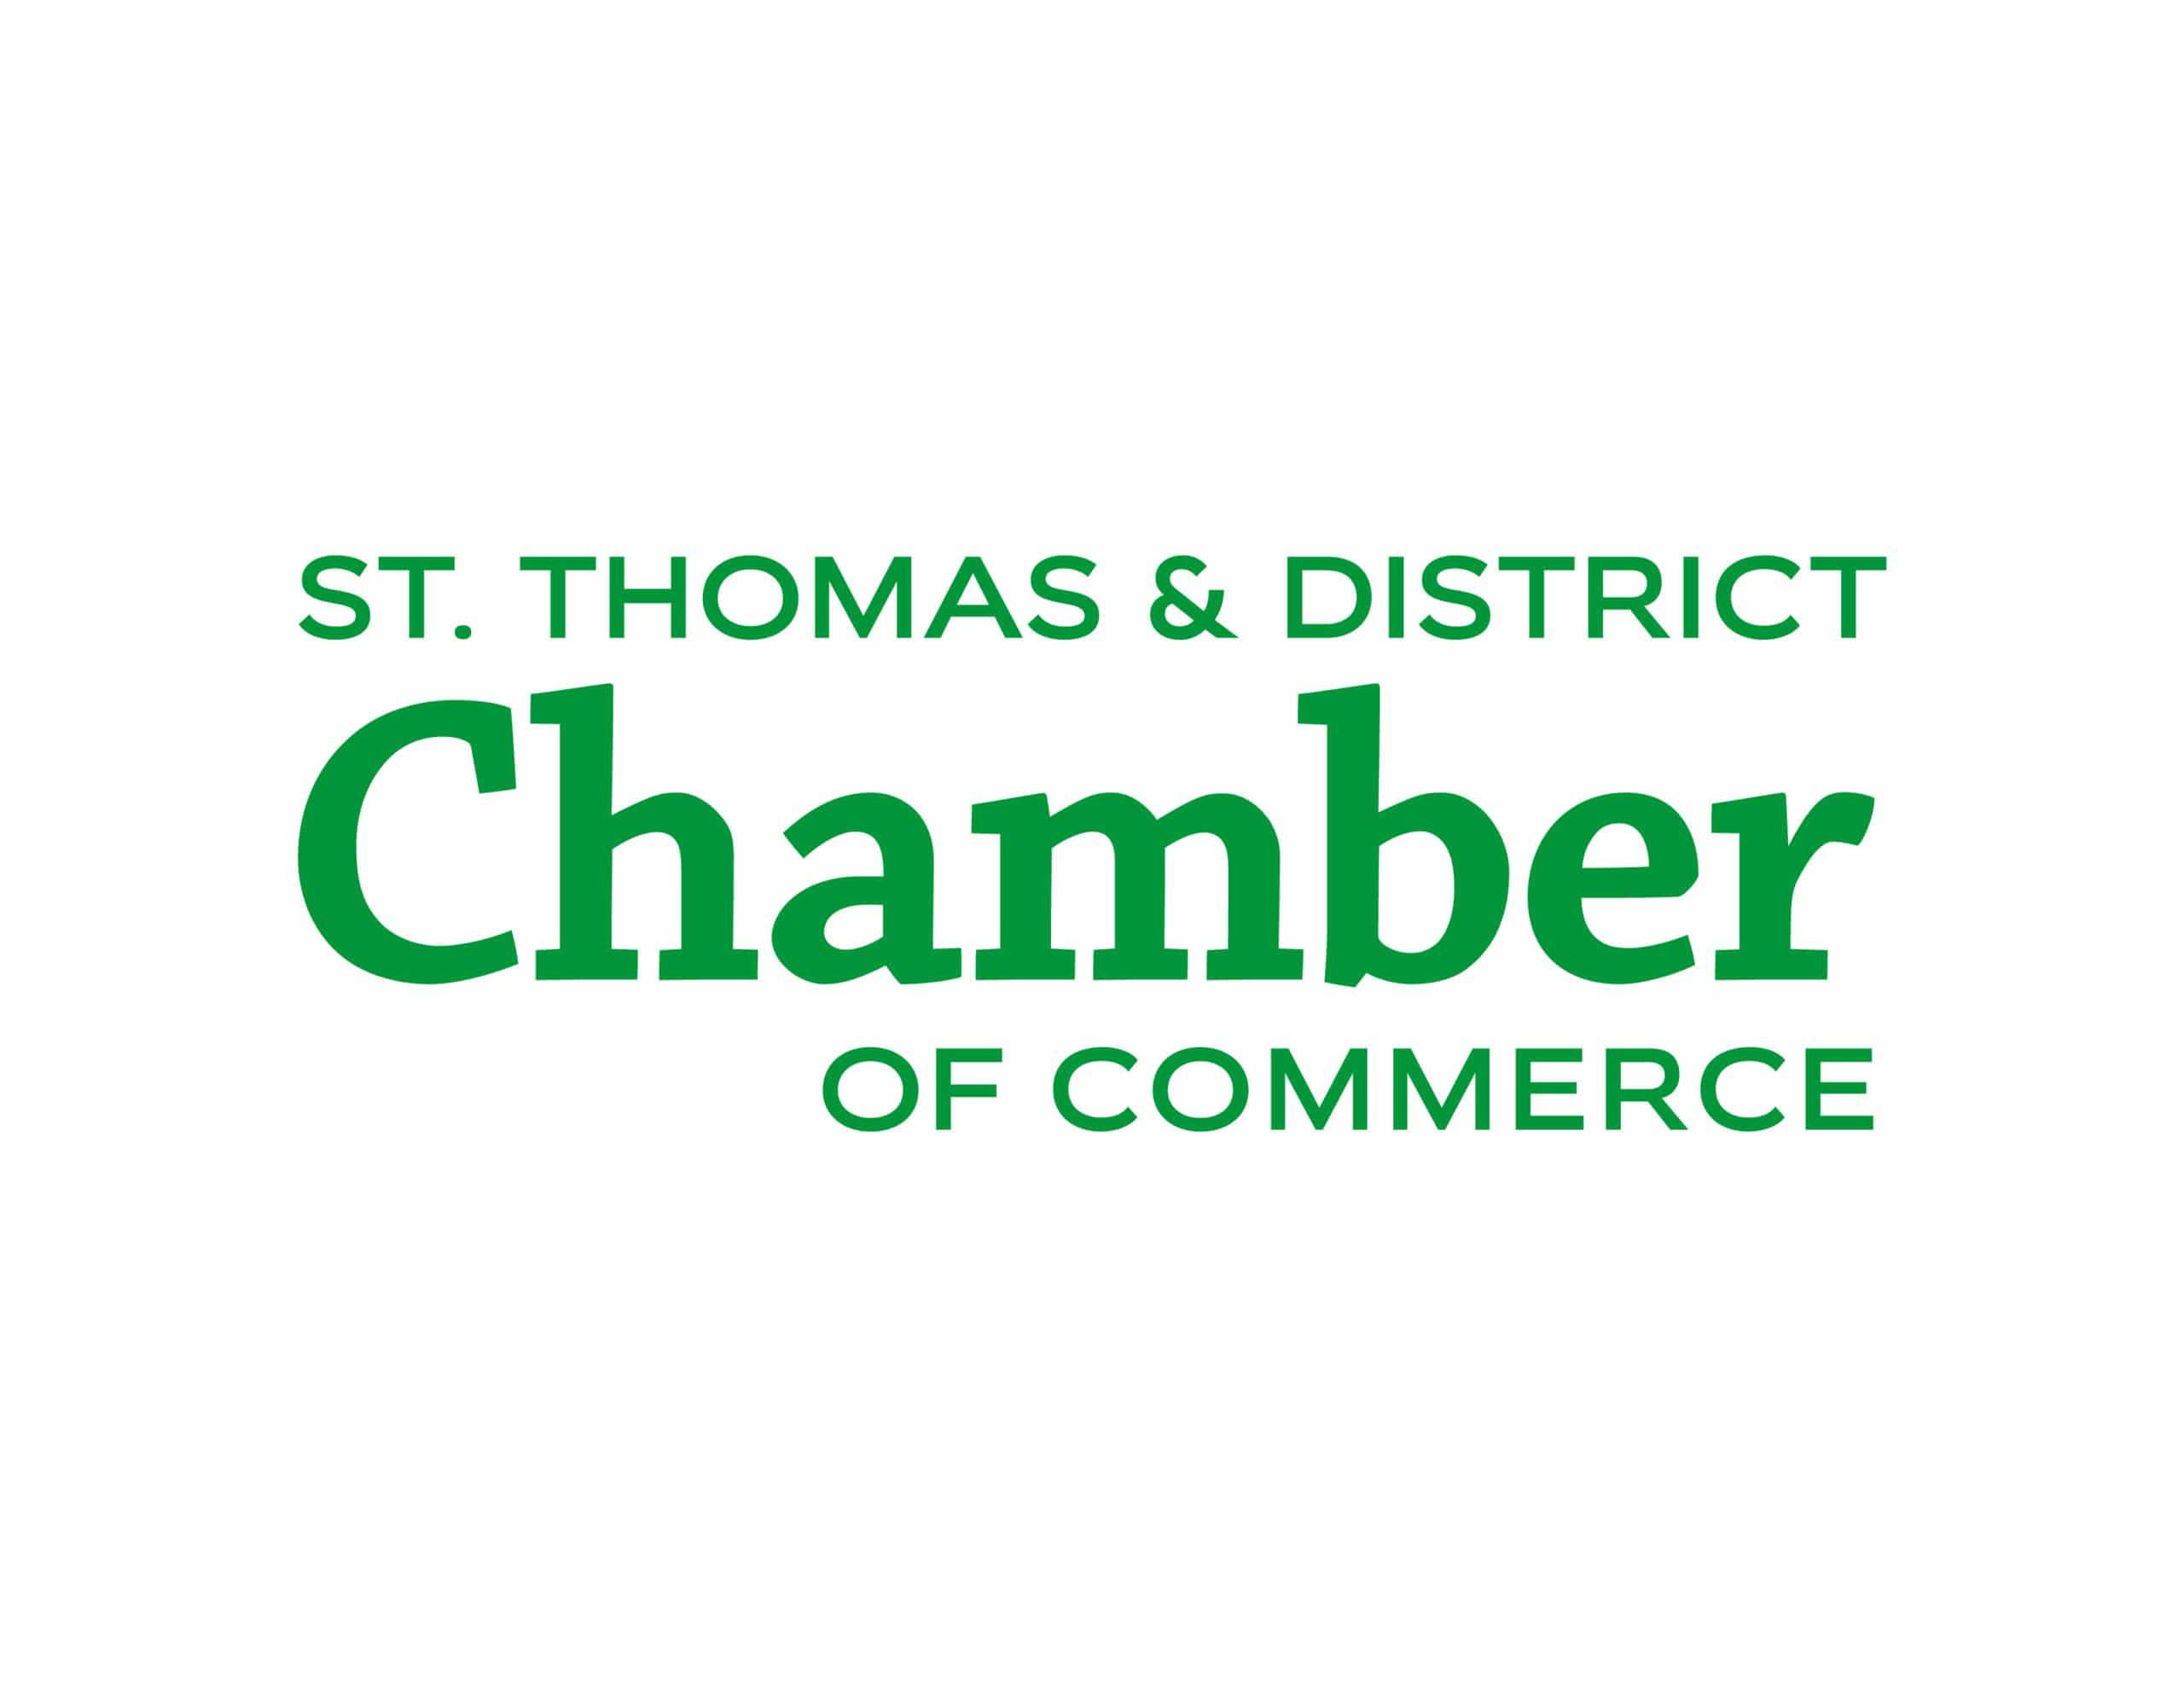 Chamber of Commerce rebrand